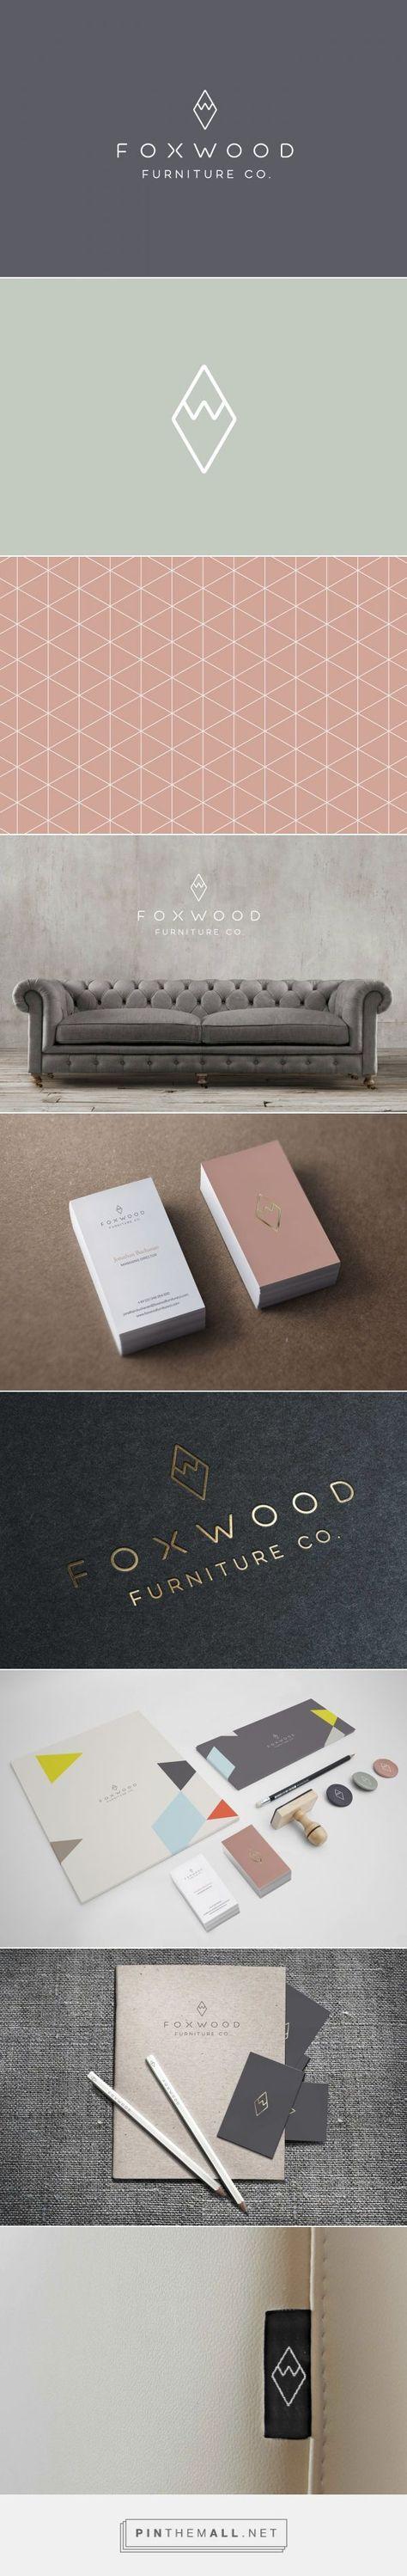 Foxwood Furniture Co   Graphic design agency   Tonik {cT}